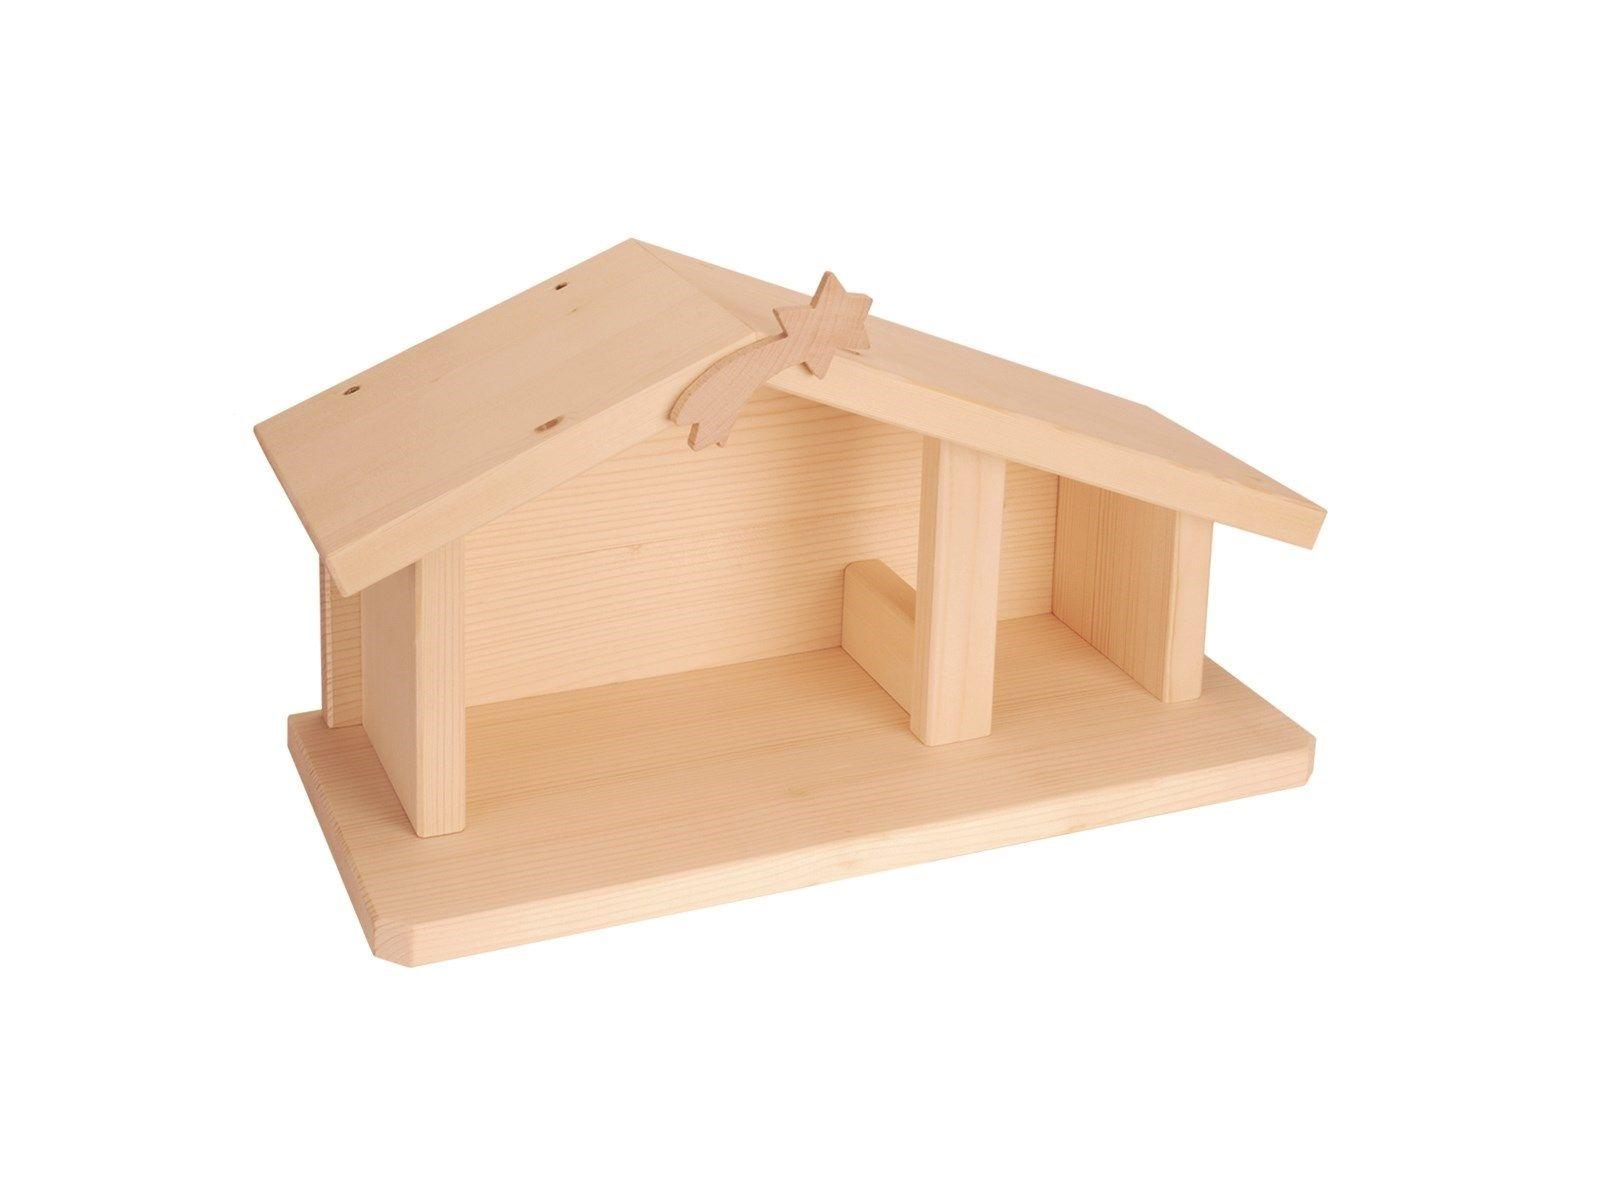 nemmer weihnachtskrippe als bastelsatz holzkrippe aus massiven fichtenholz sonstiges. Black Bedroom Furniture Sets. Home Design Ideas